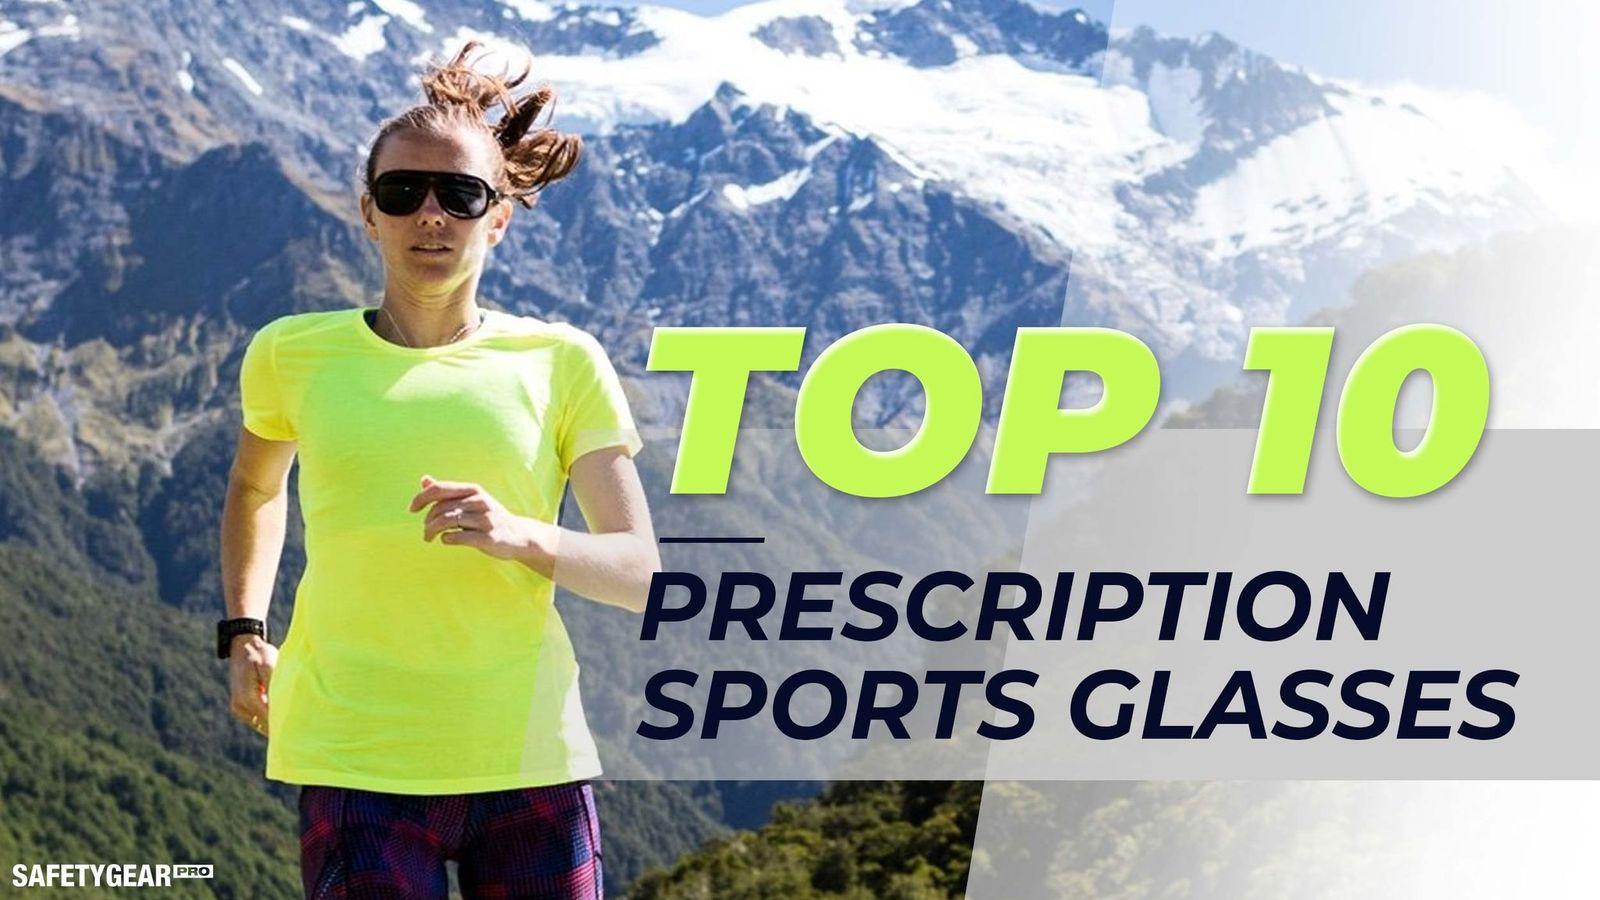 Top 10 Prescription Sports Glasses Header